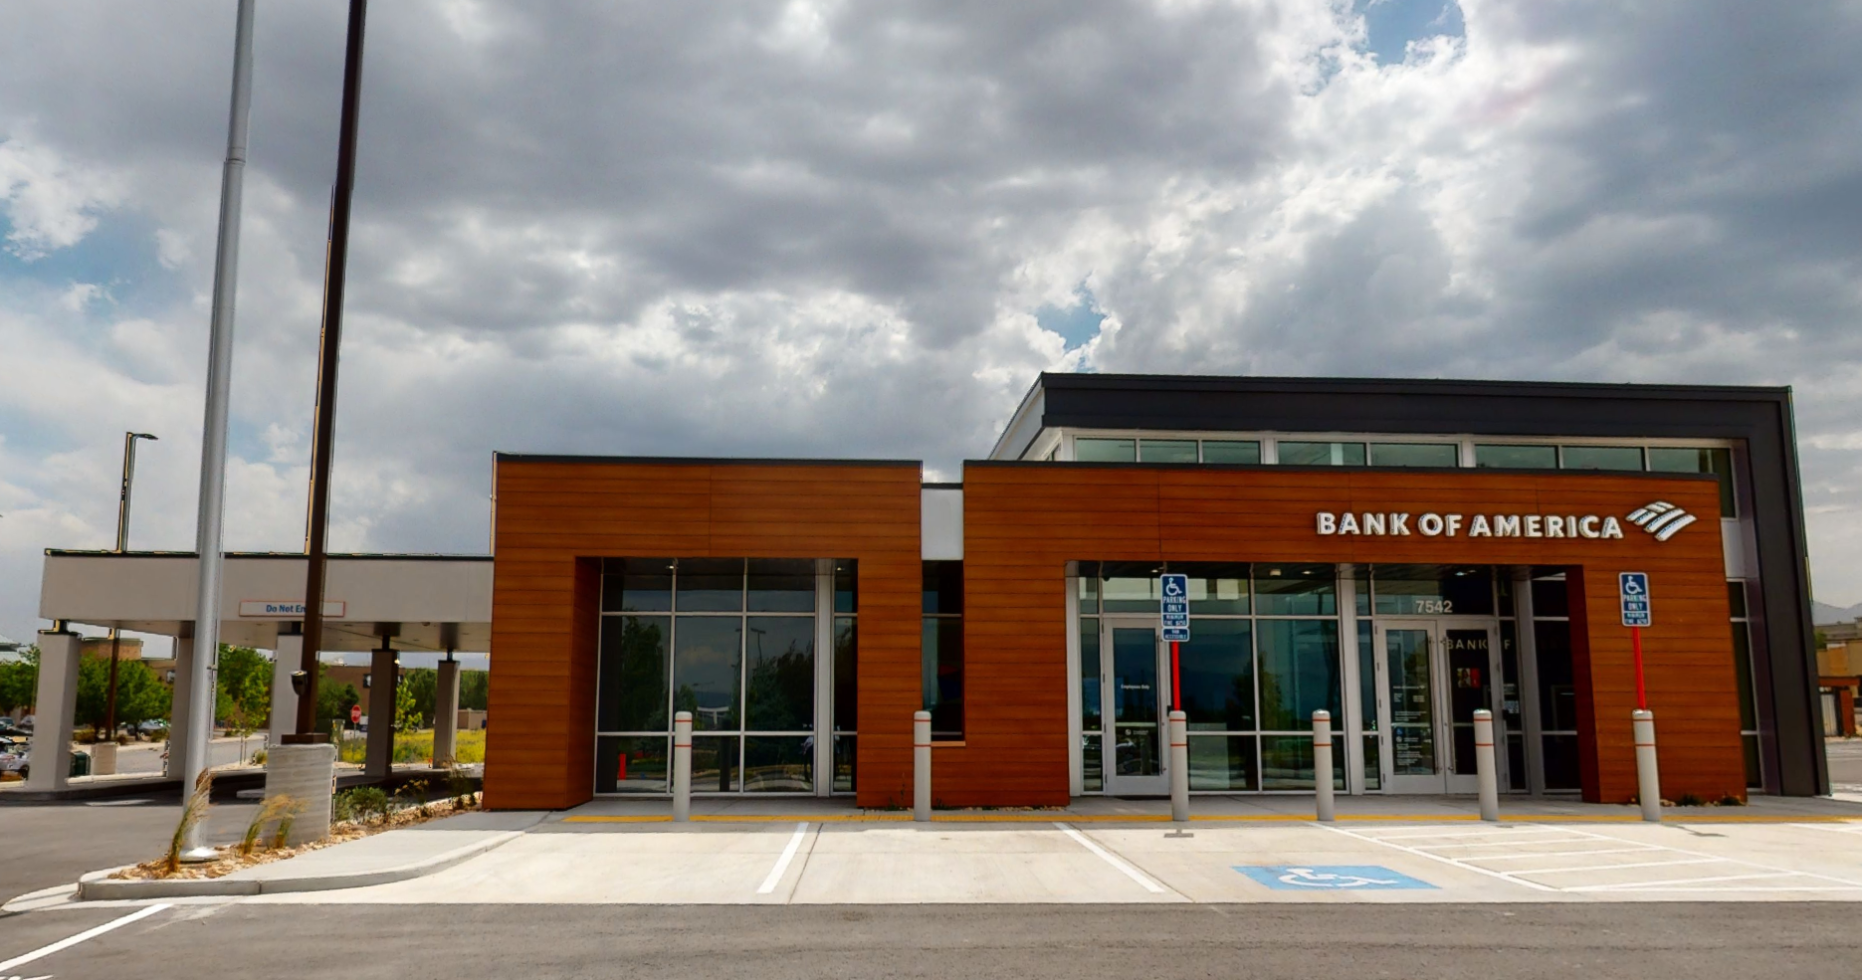 Bank of America financial center with drive-thru ATM   7542 S Plaza Center Dr, West Jordan, UT 84084